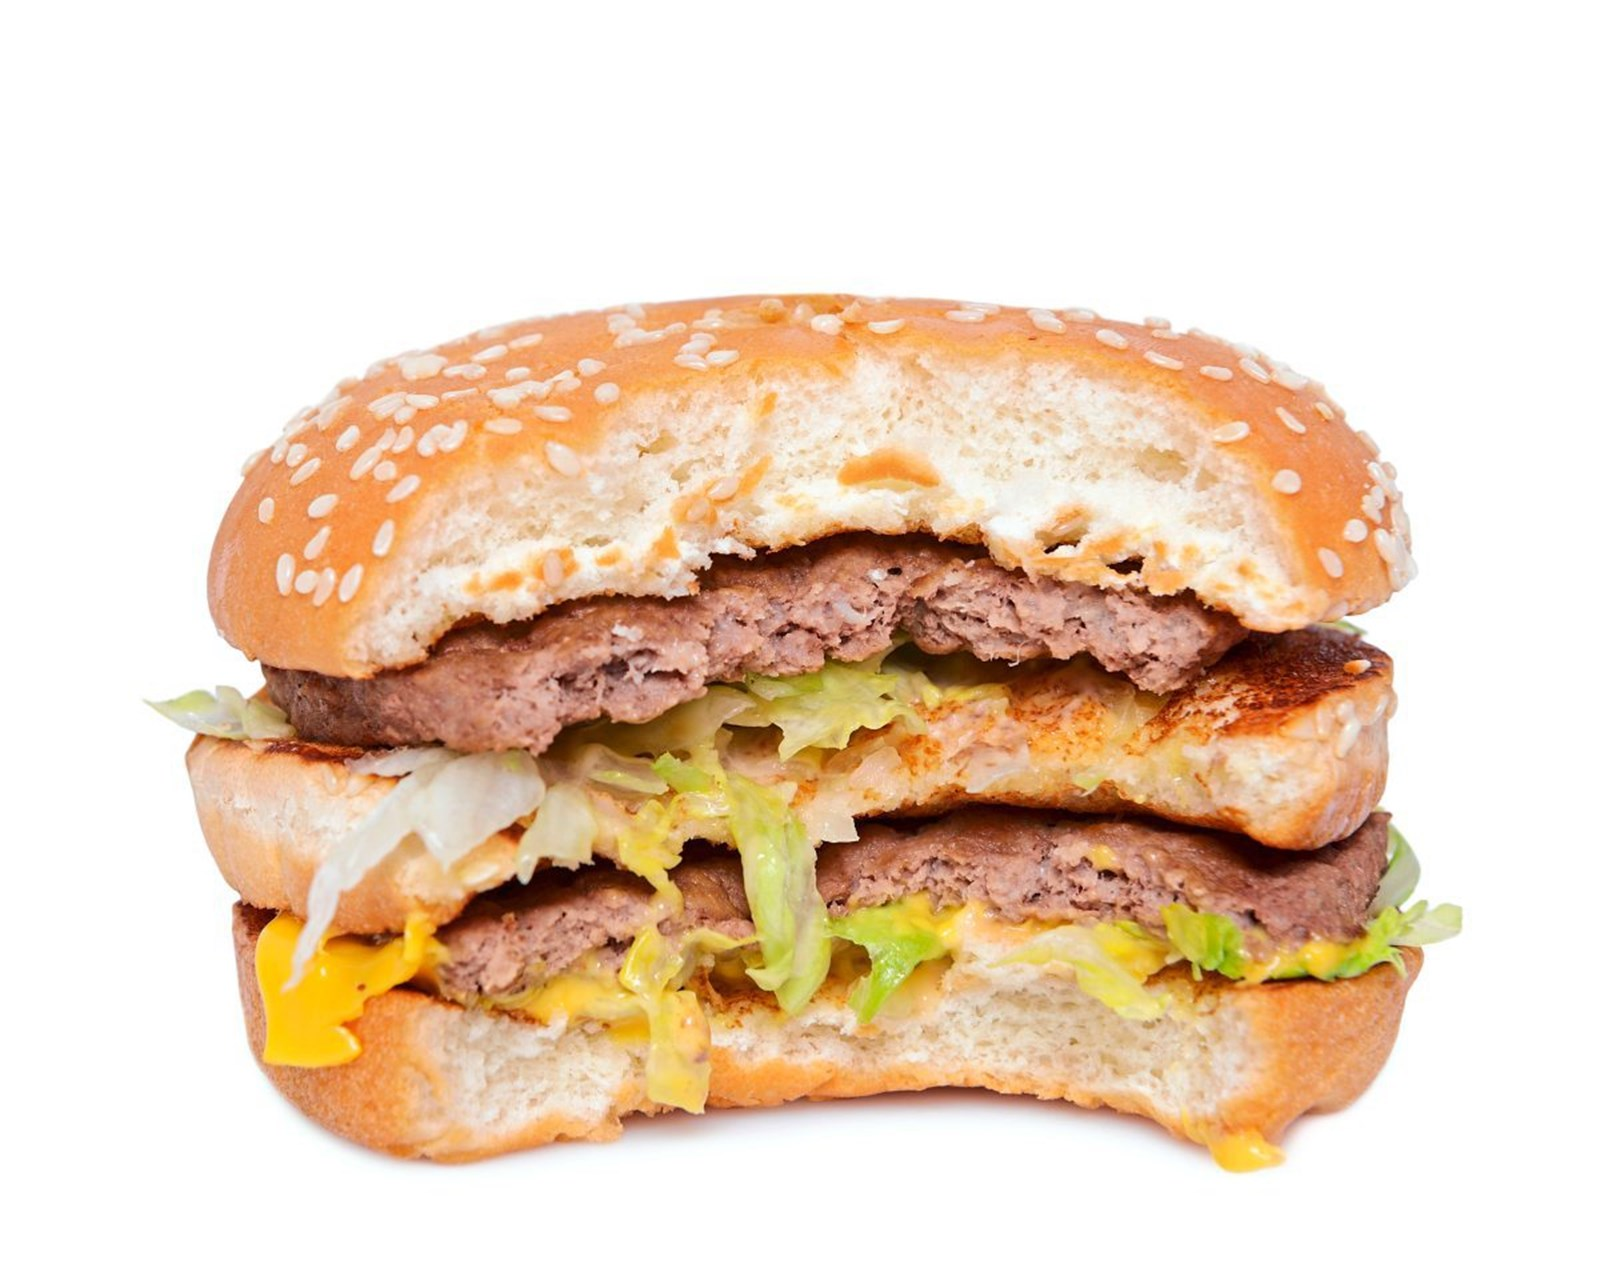 Ein McDonald's-Spitzenmanager packt aus